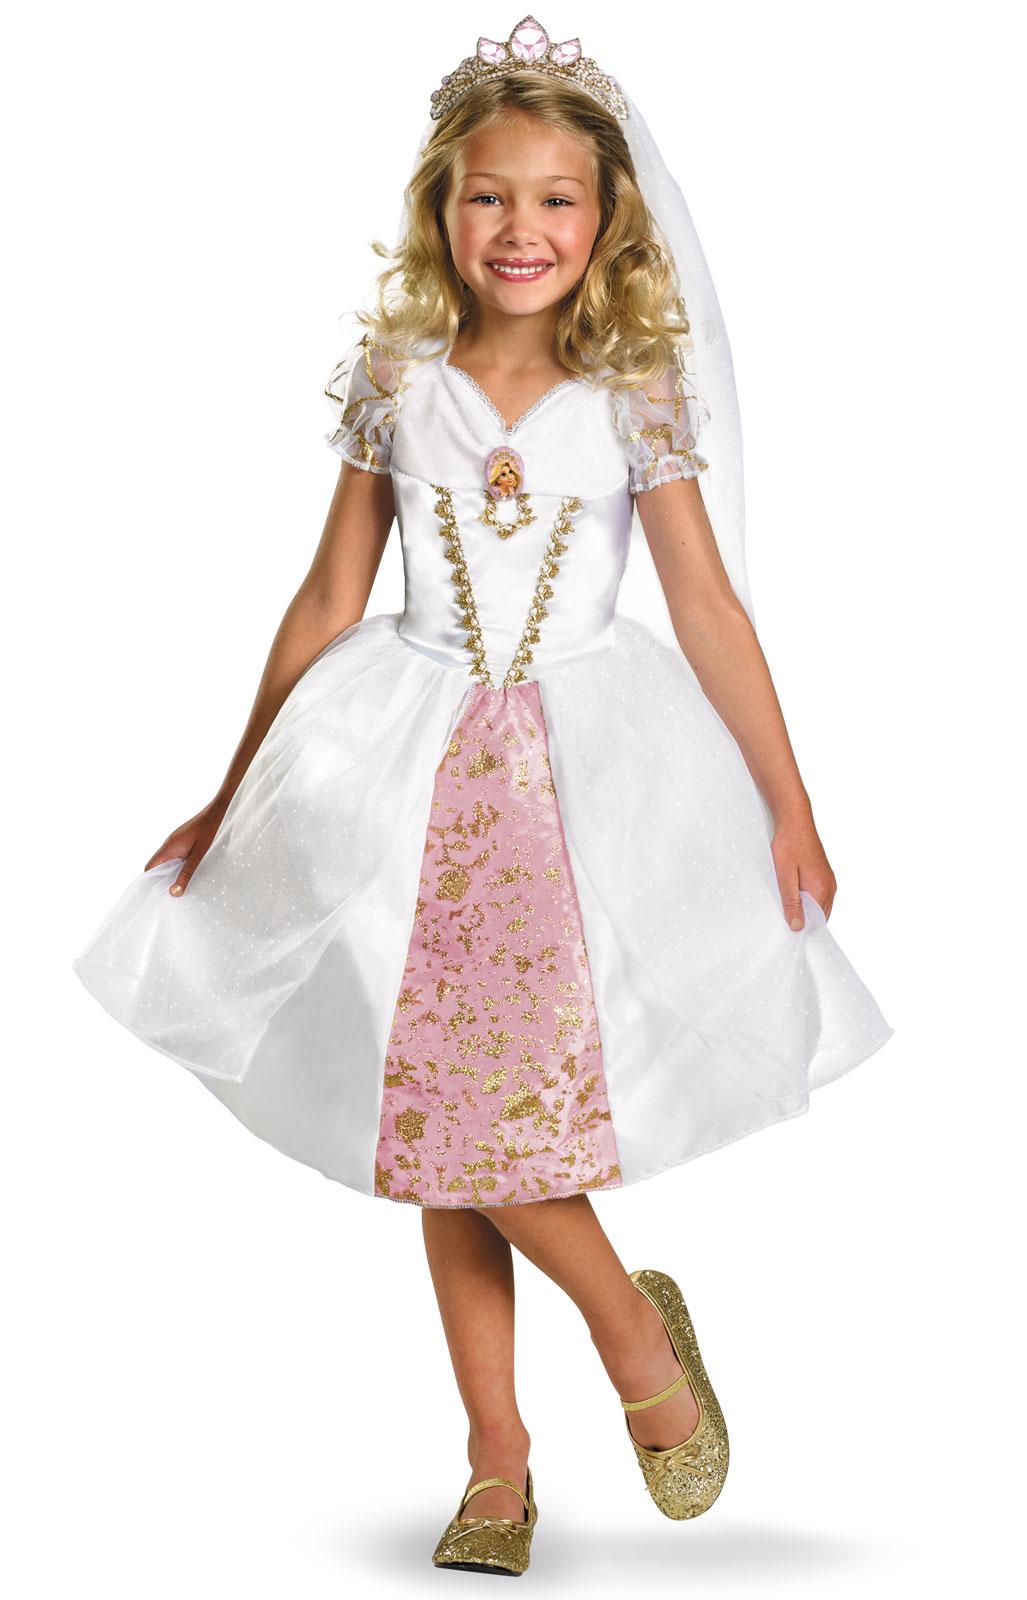 disney tangled rapunzel wedding gown toddler costume | buycostumes